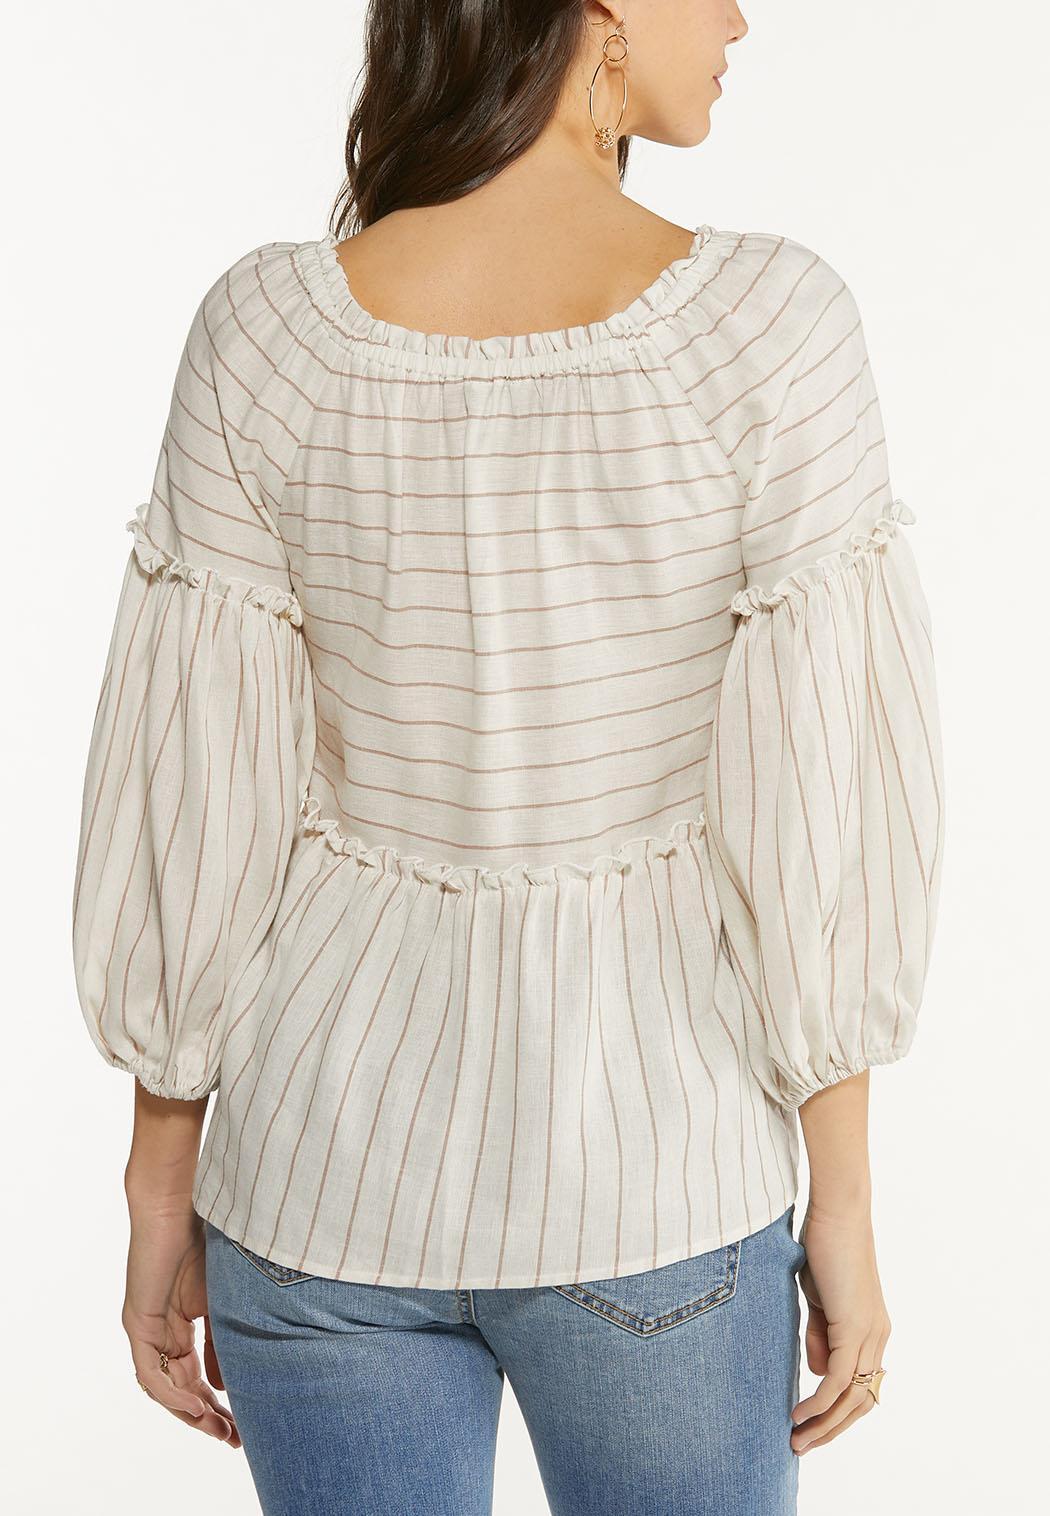 Striped Linen Babydoll Top (Item #44488522)